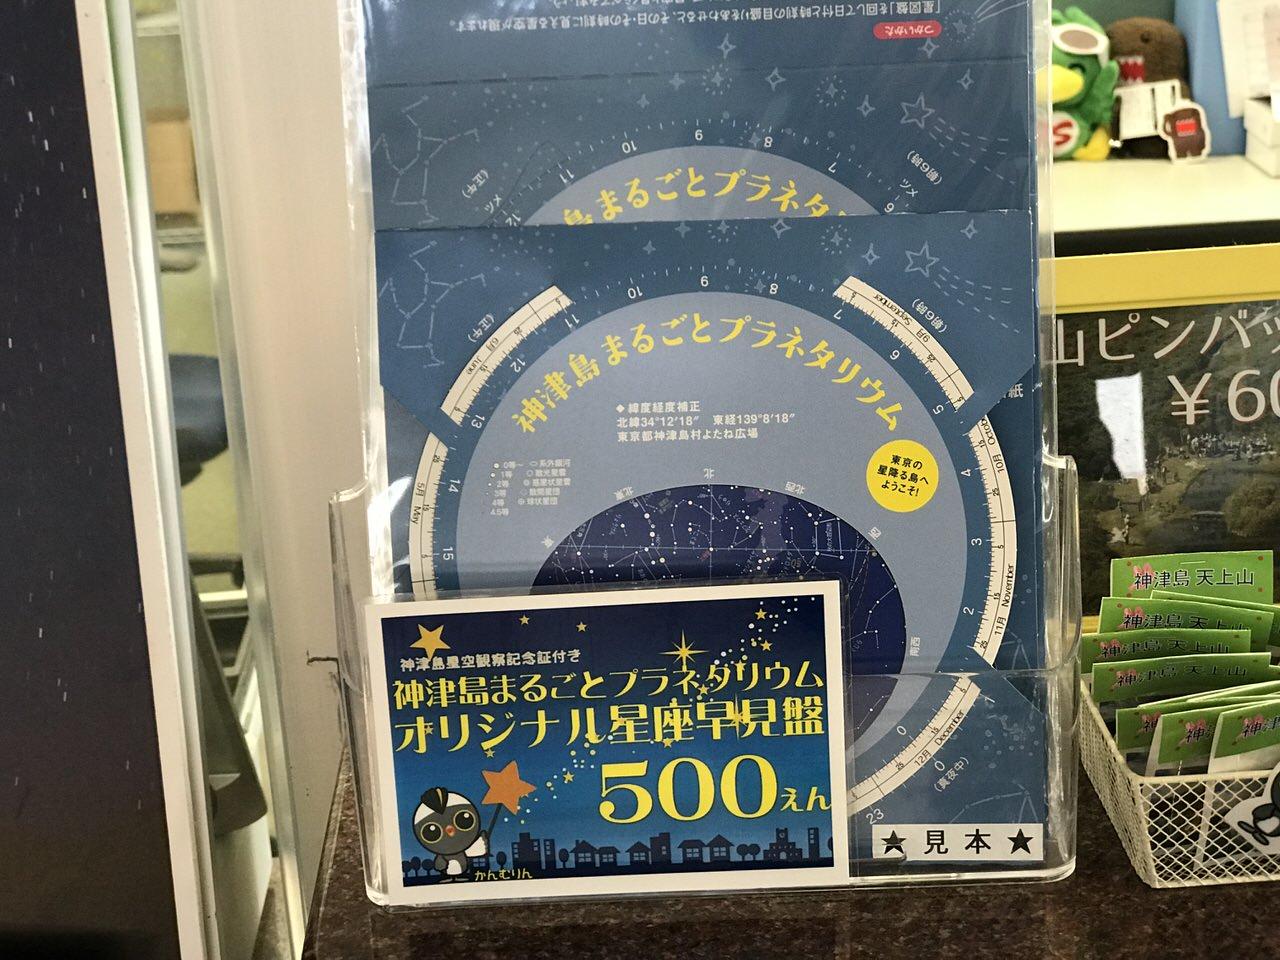 Kozushima tamashima 4914